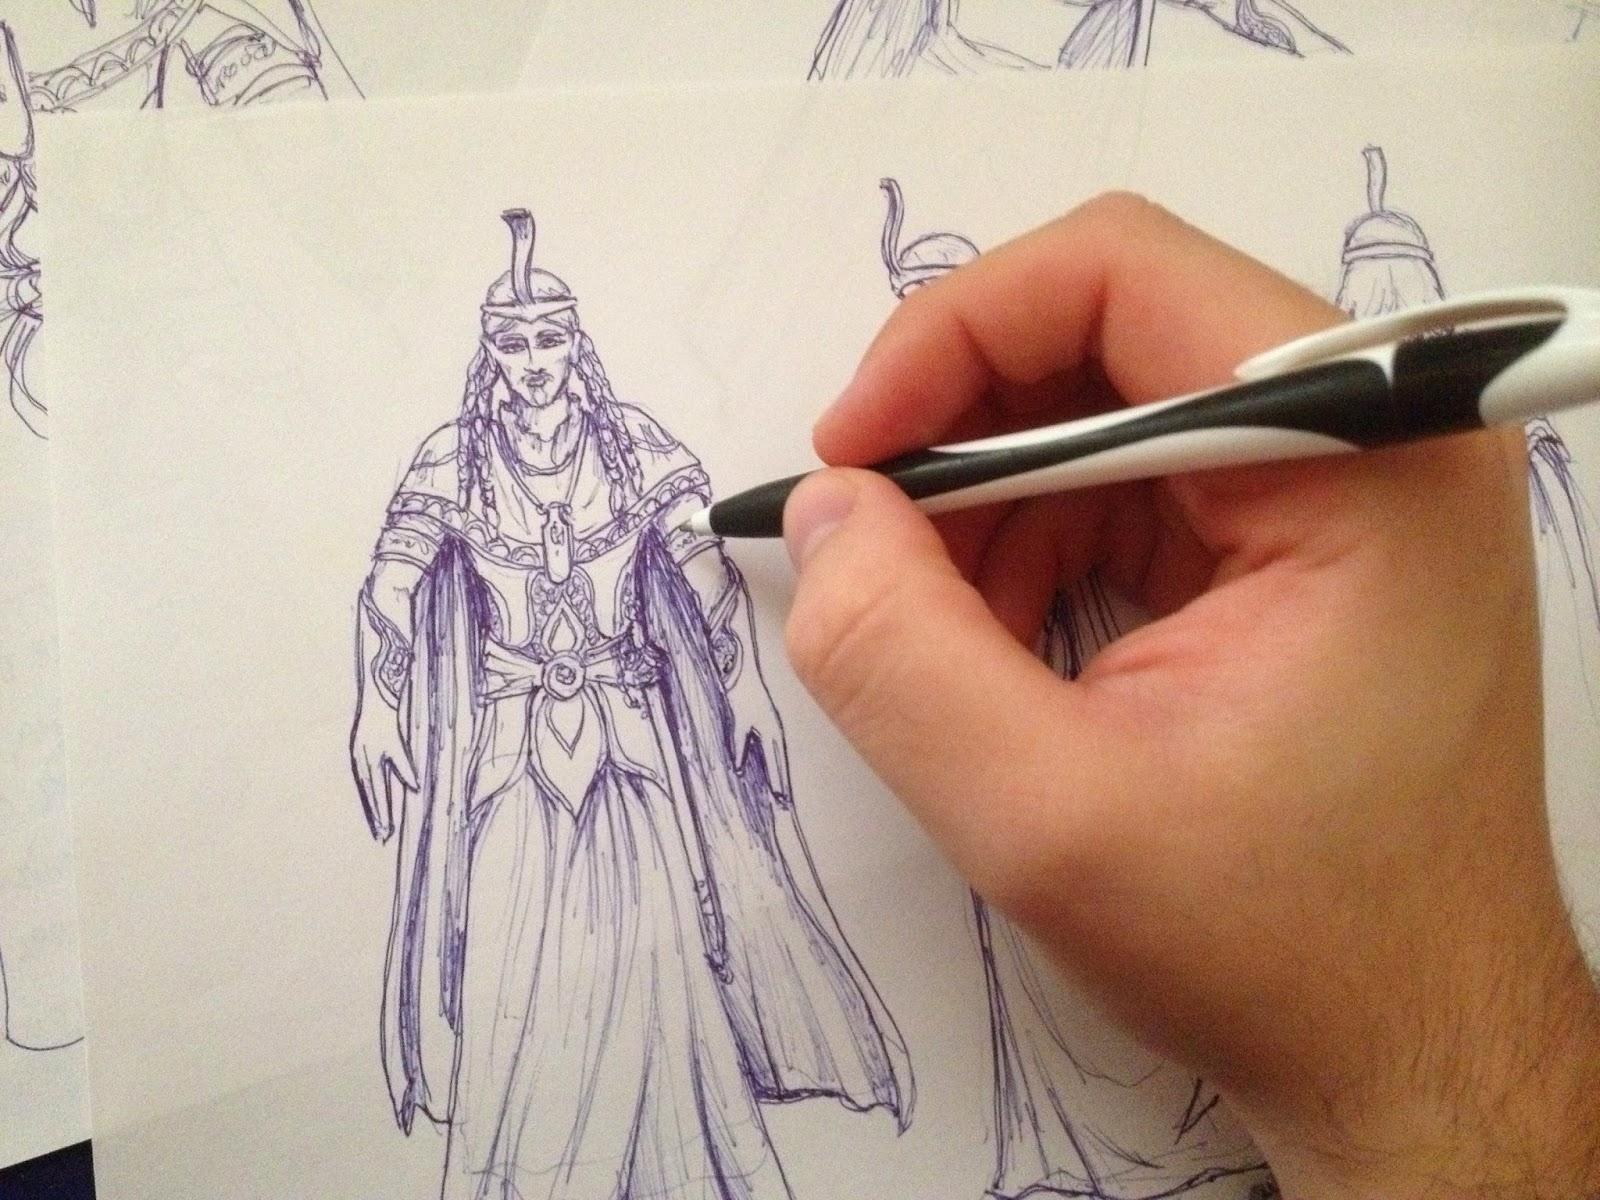 Hand-drawn sketch